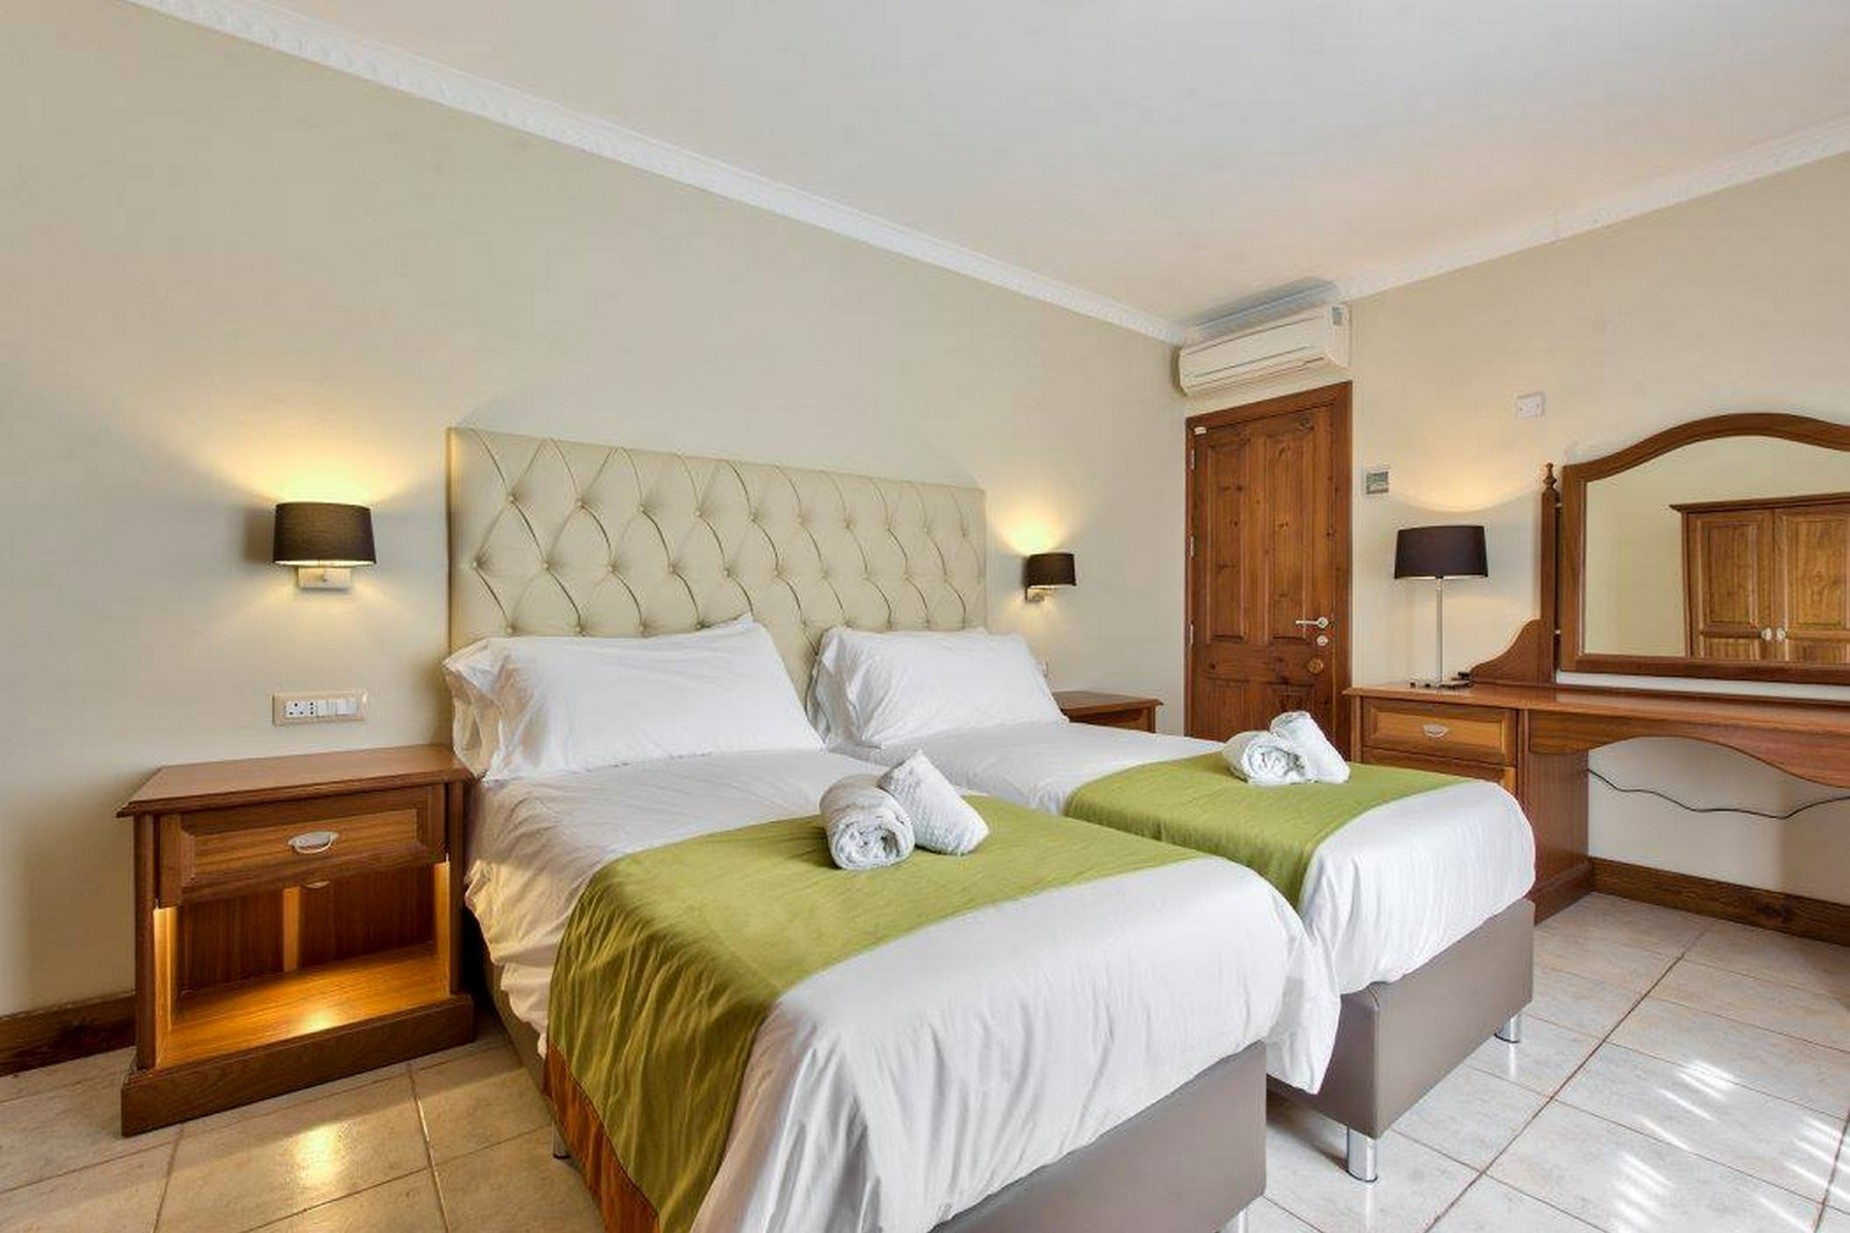 3 bed Villa For Rent in Mellieha, Mellieha - thumb 15